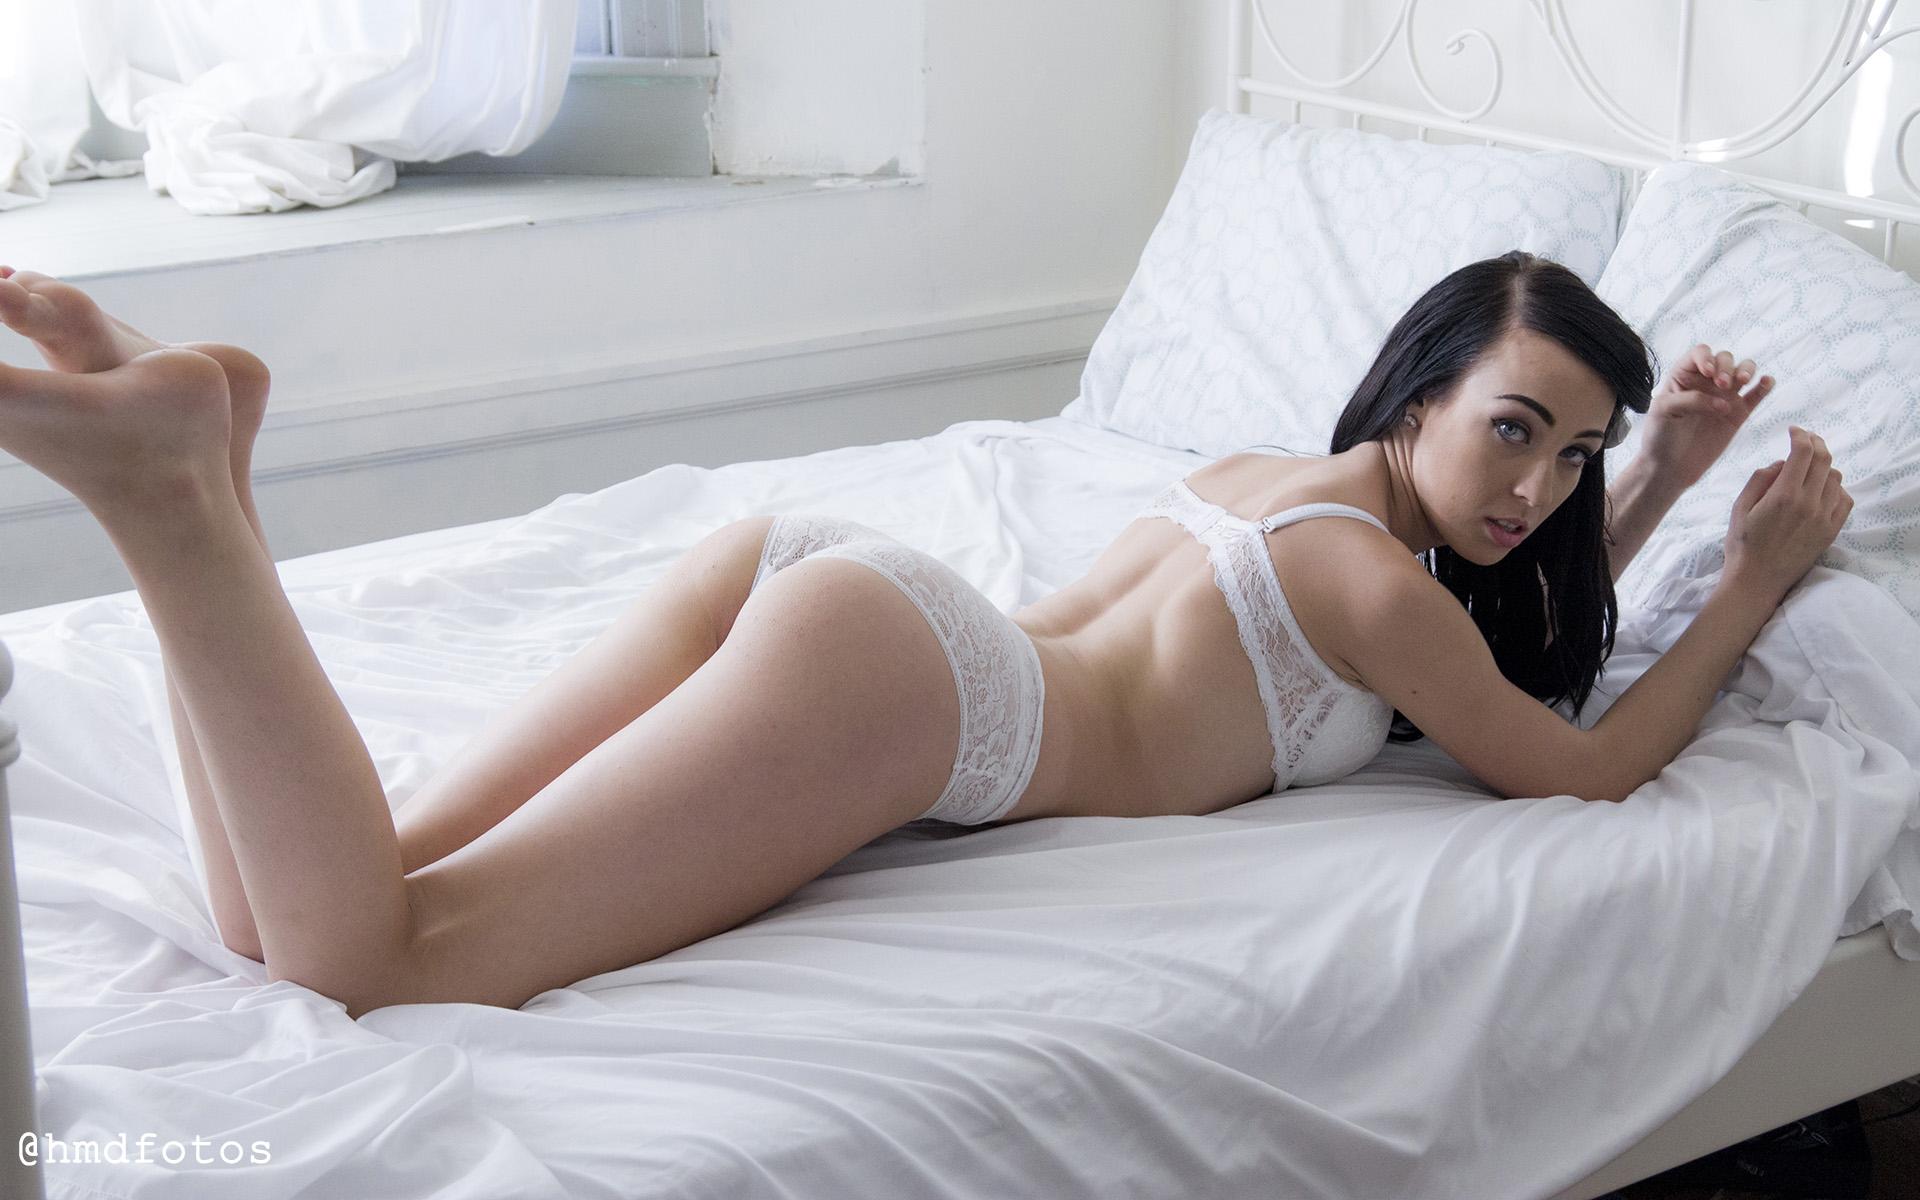 Photographer PeeJays Nude Art and Photography at Model Society